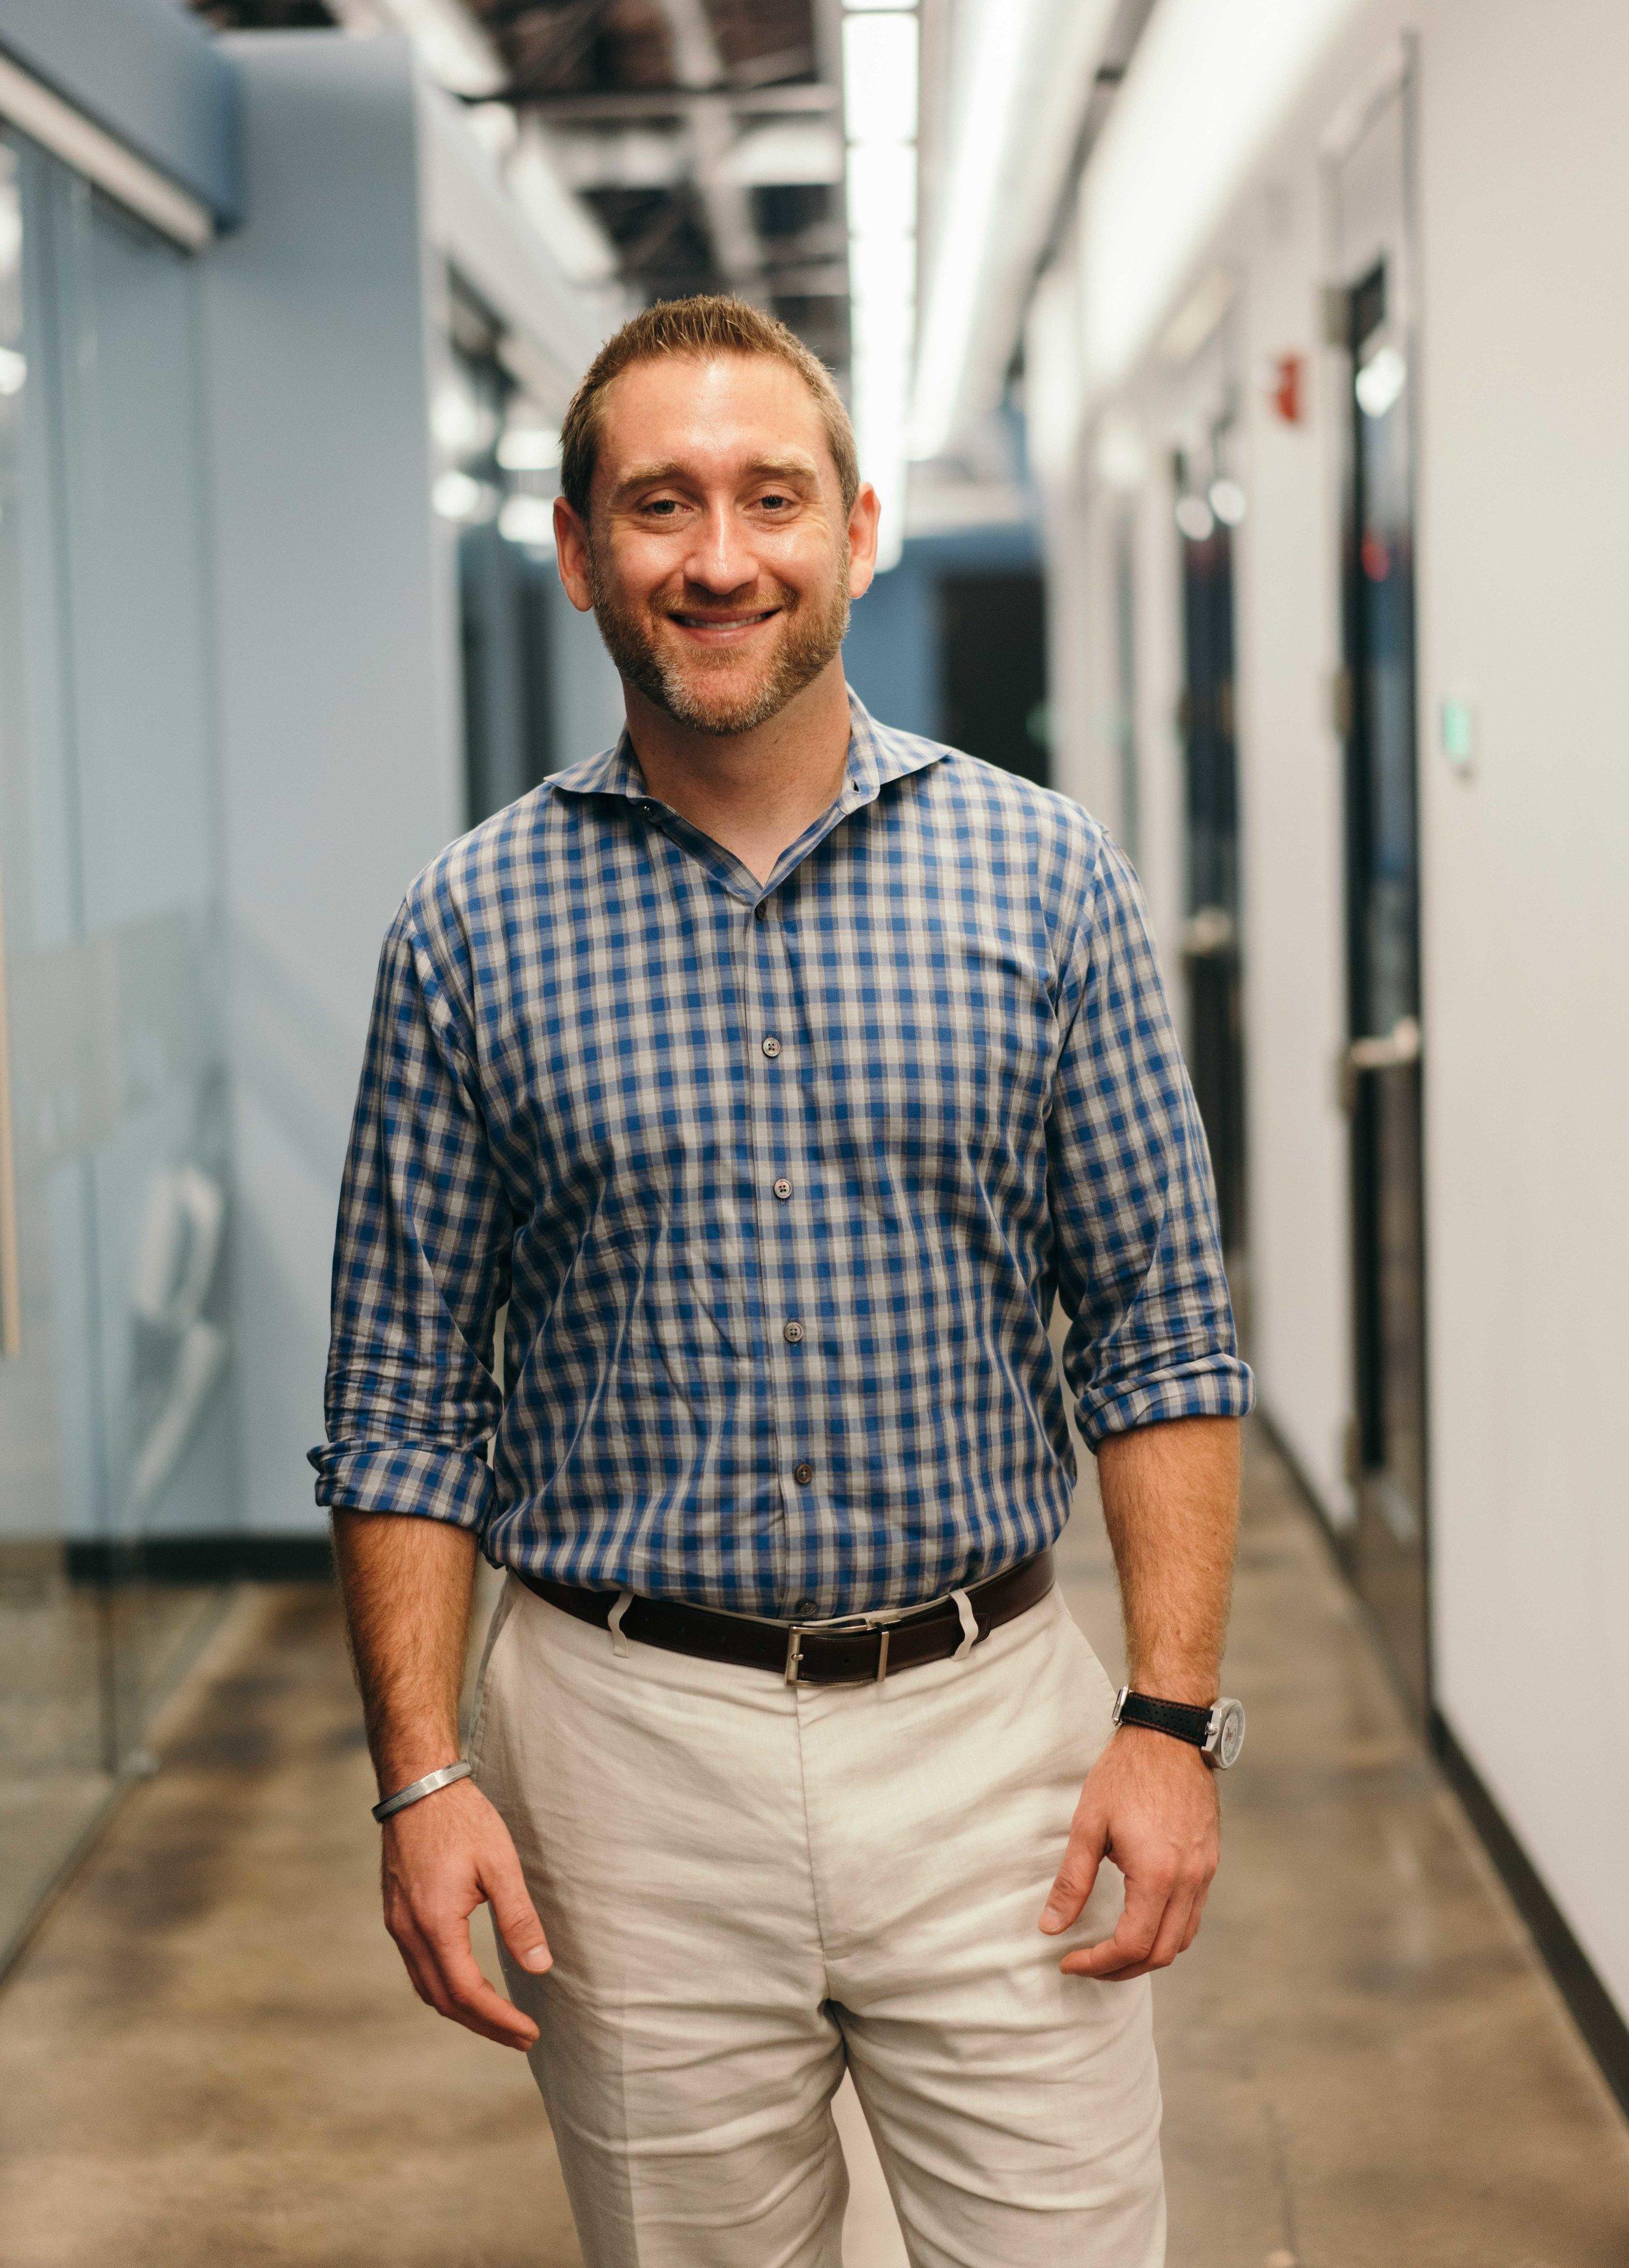 Michael Brody-Waite, CEO of the Nashville Entrepreneur Center